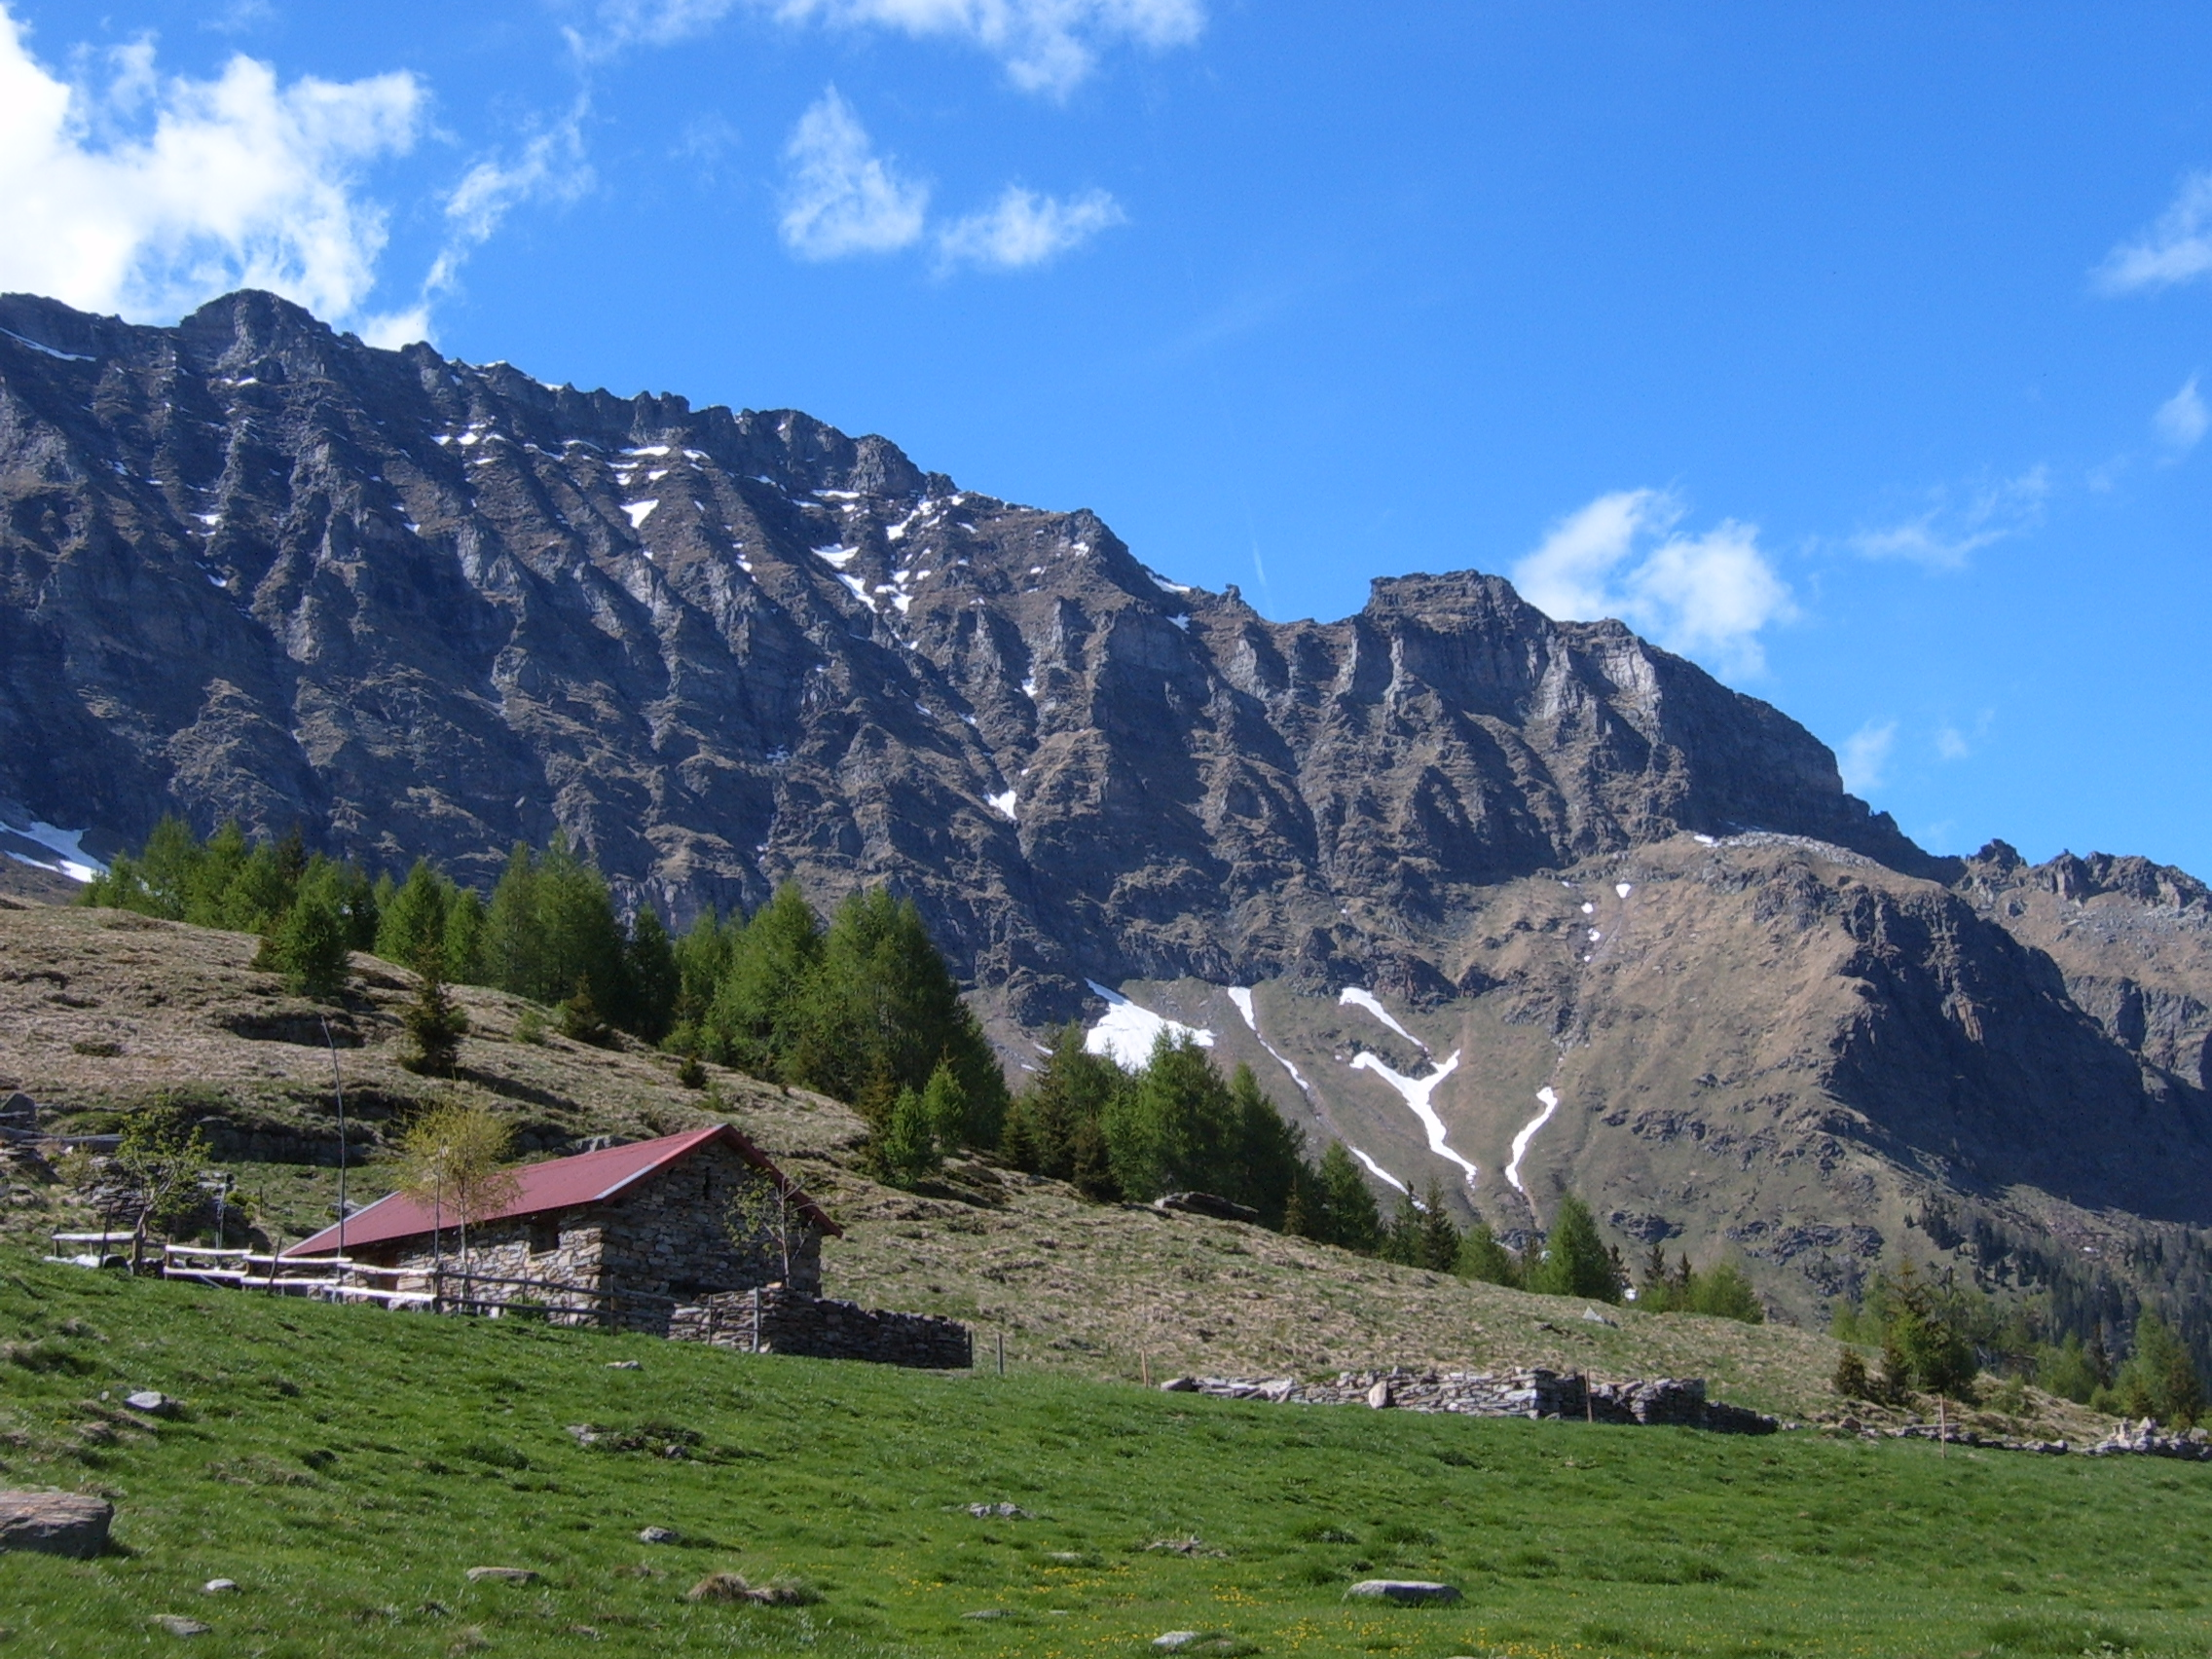 FileCalanca Alp de Cascinarsajpg  Wikimedia Commons